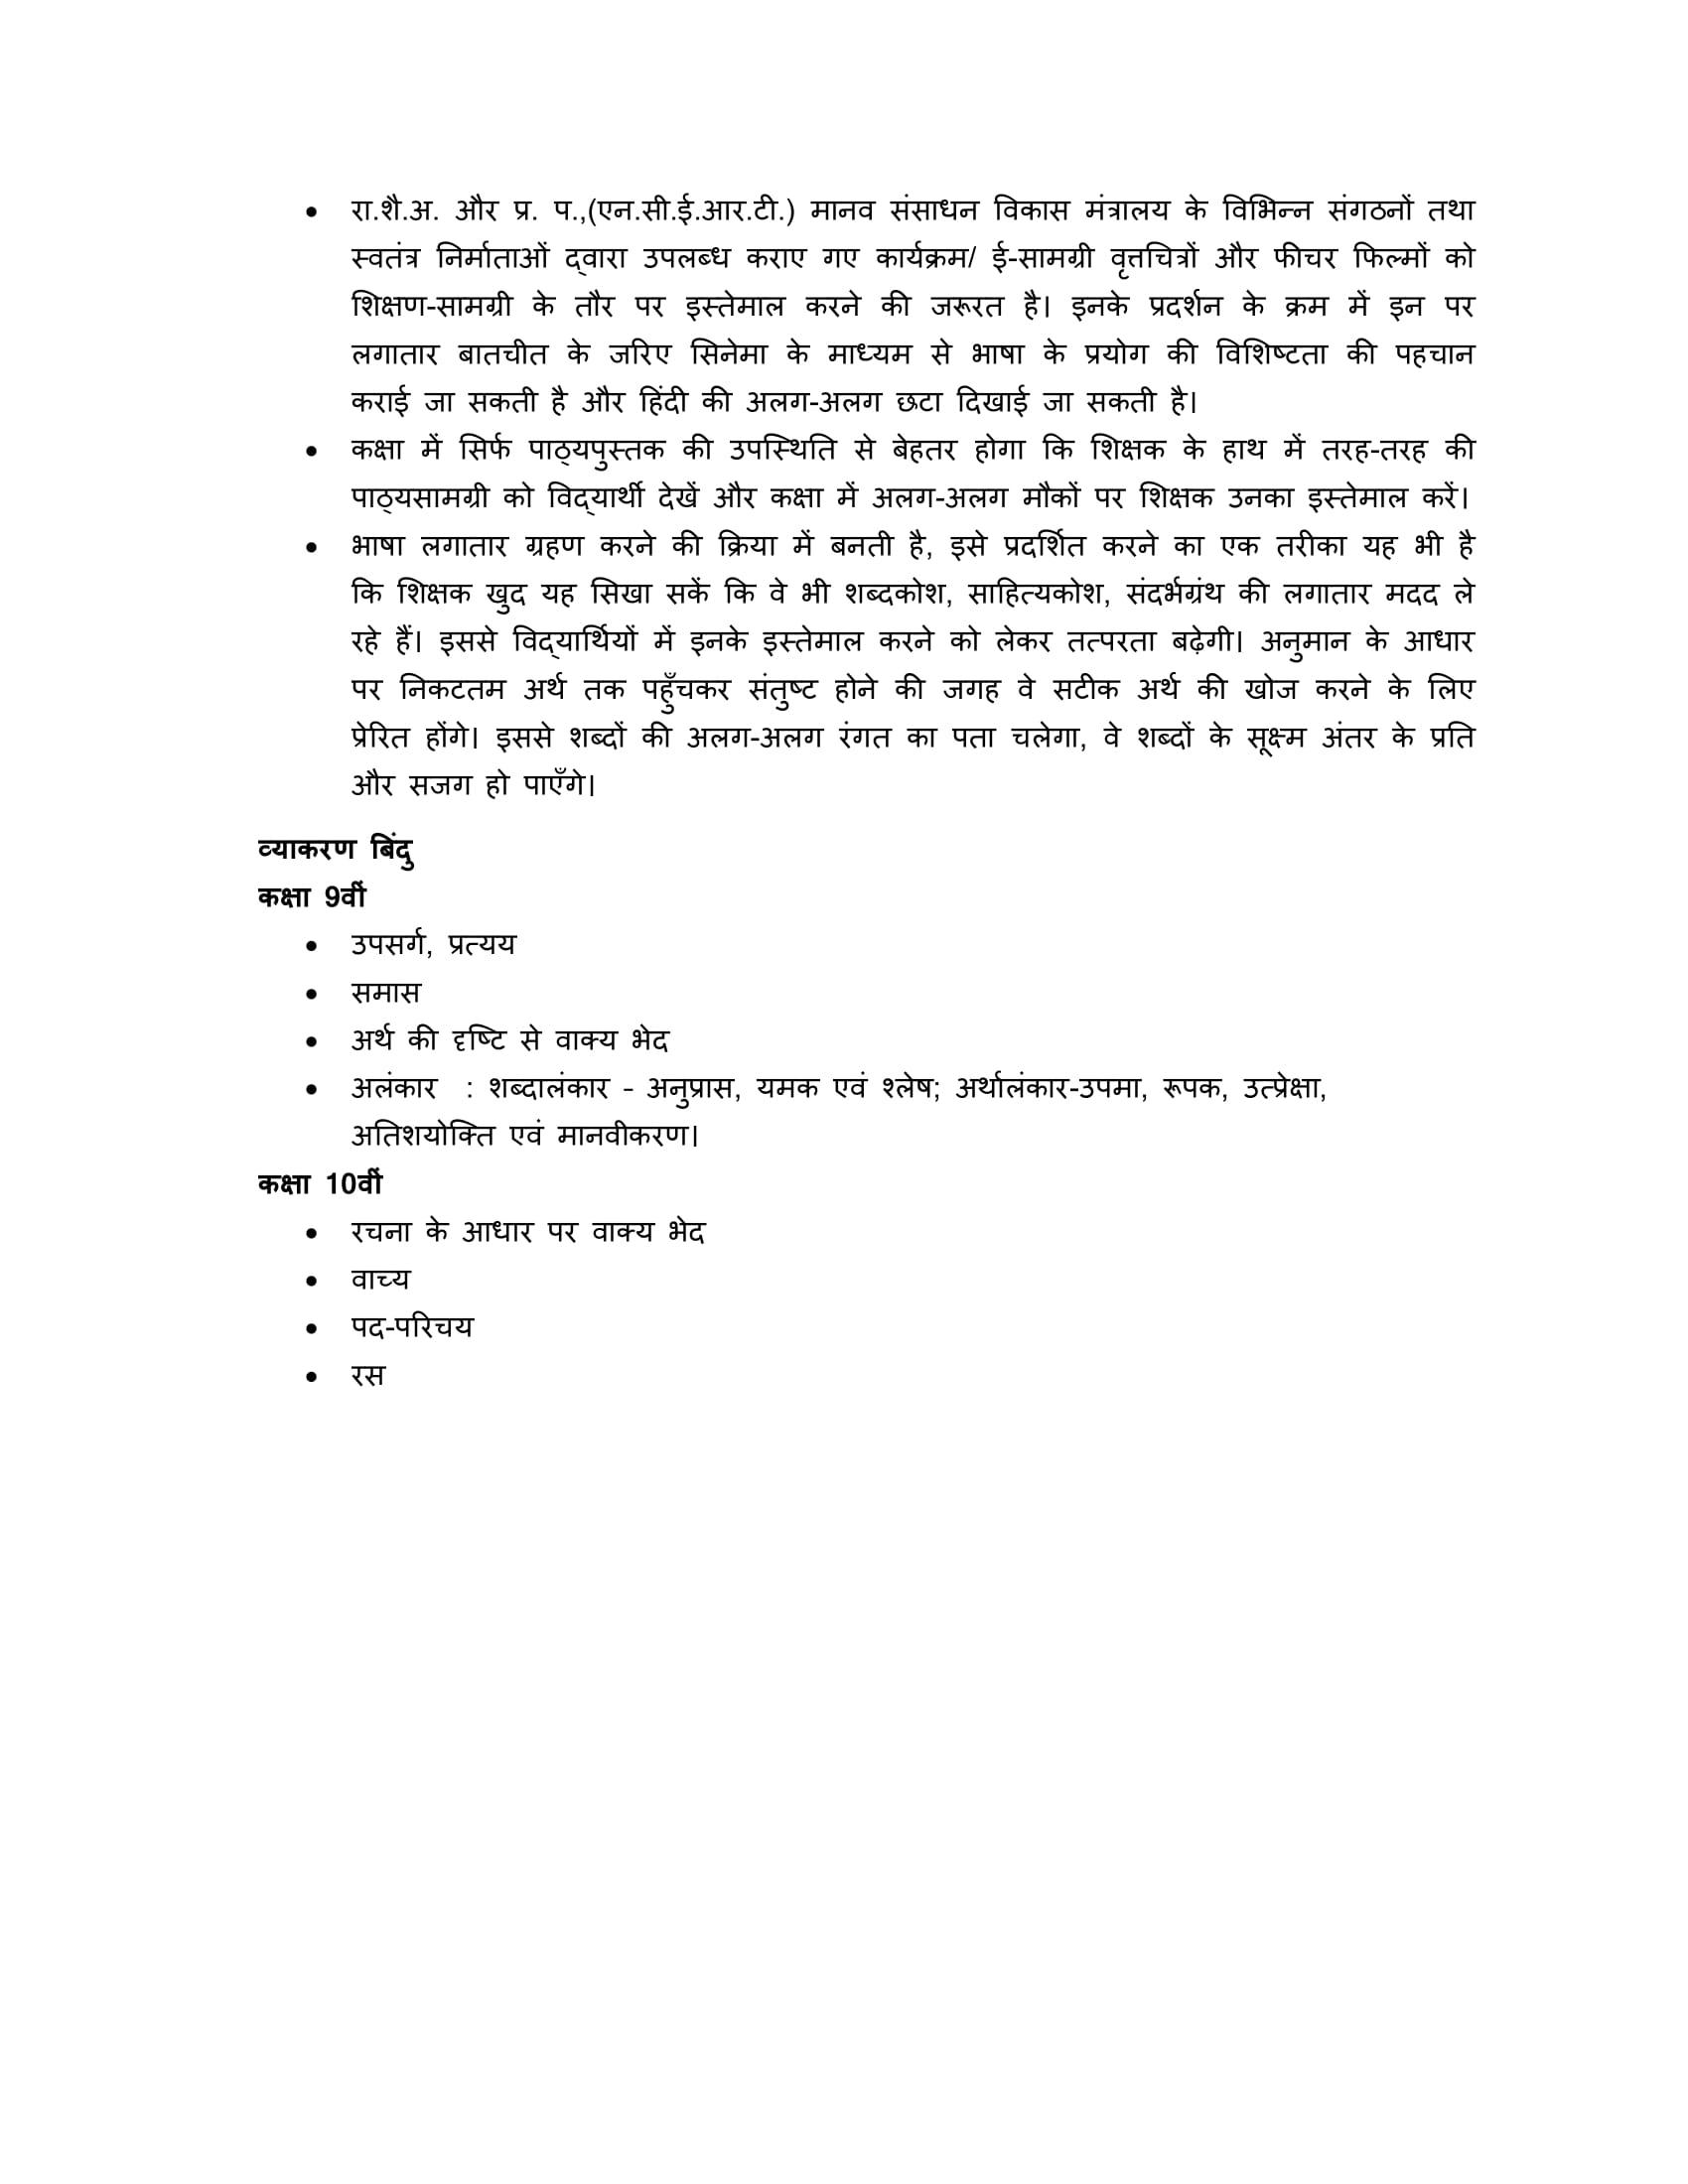 Hindi A Sec 2020 21 class 9 10 03